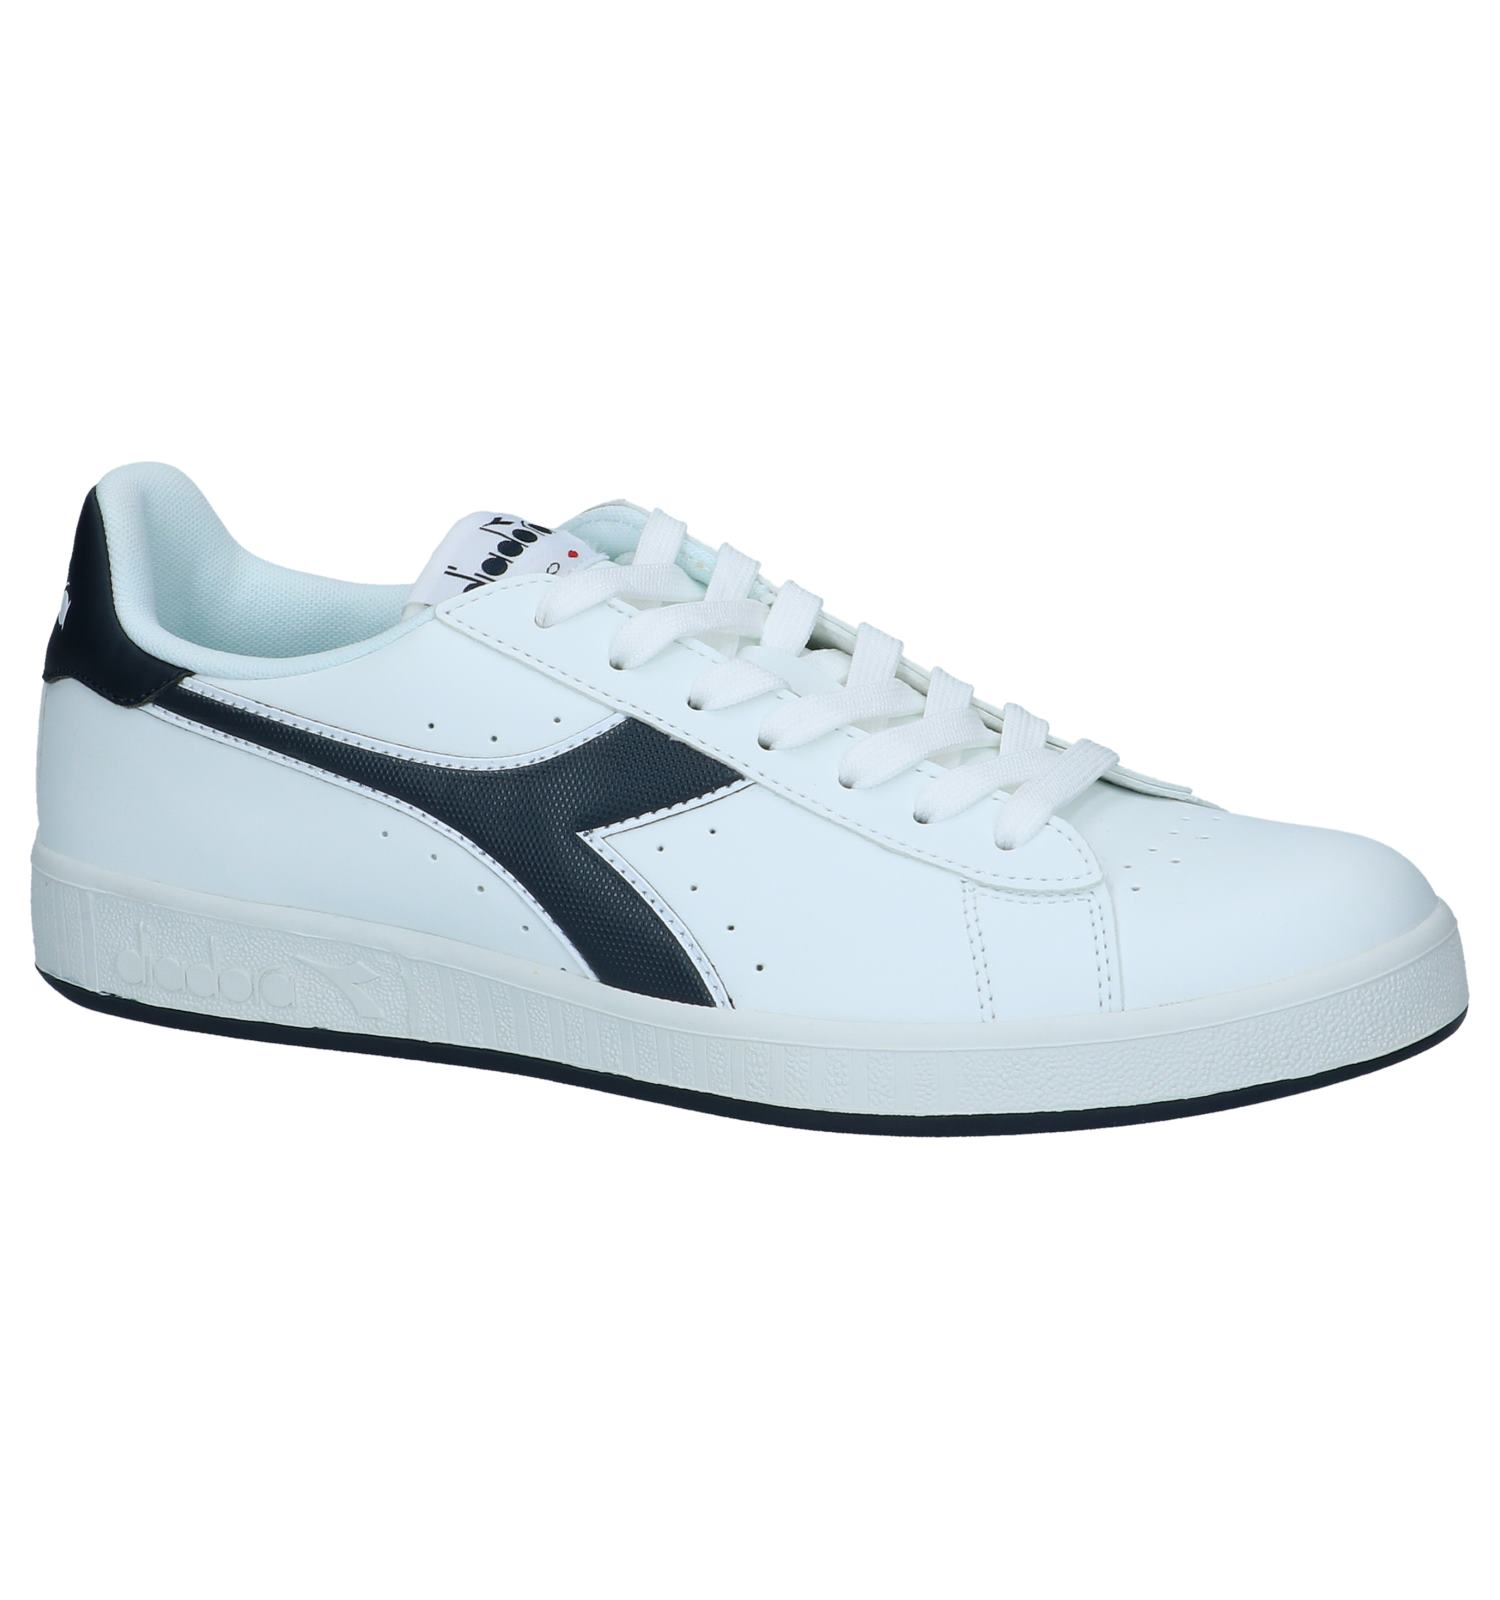 Witte Sneakers Diadora Game P | TORFS.BE | Gratis verzend en retour